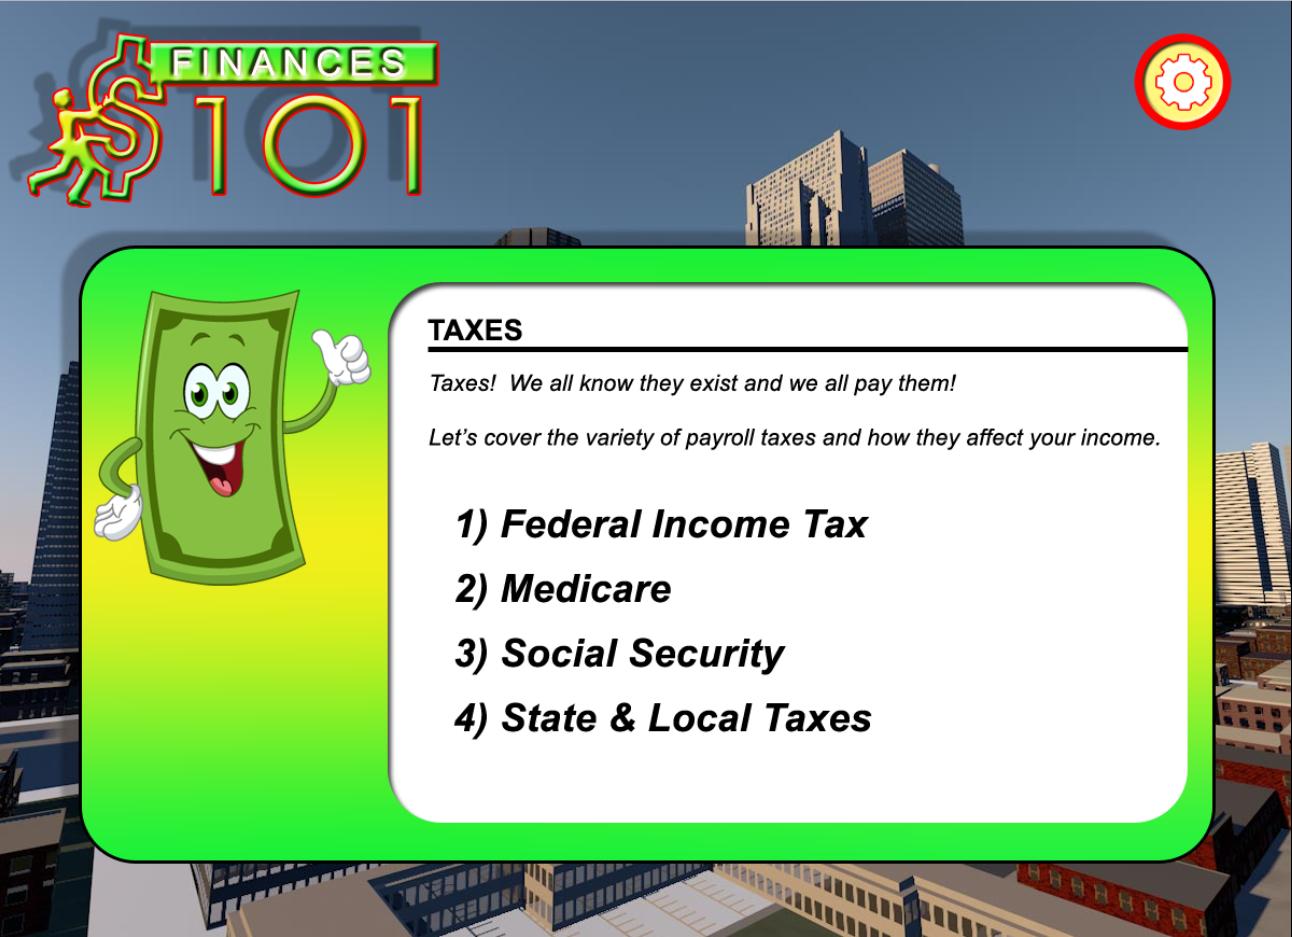 Finances 101 Tax info screen